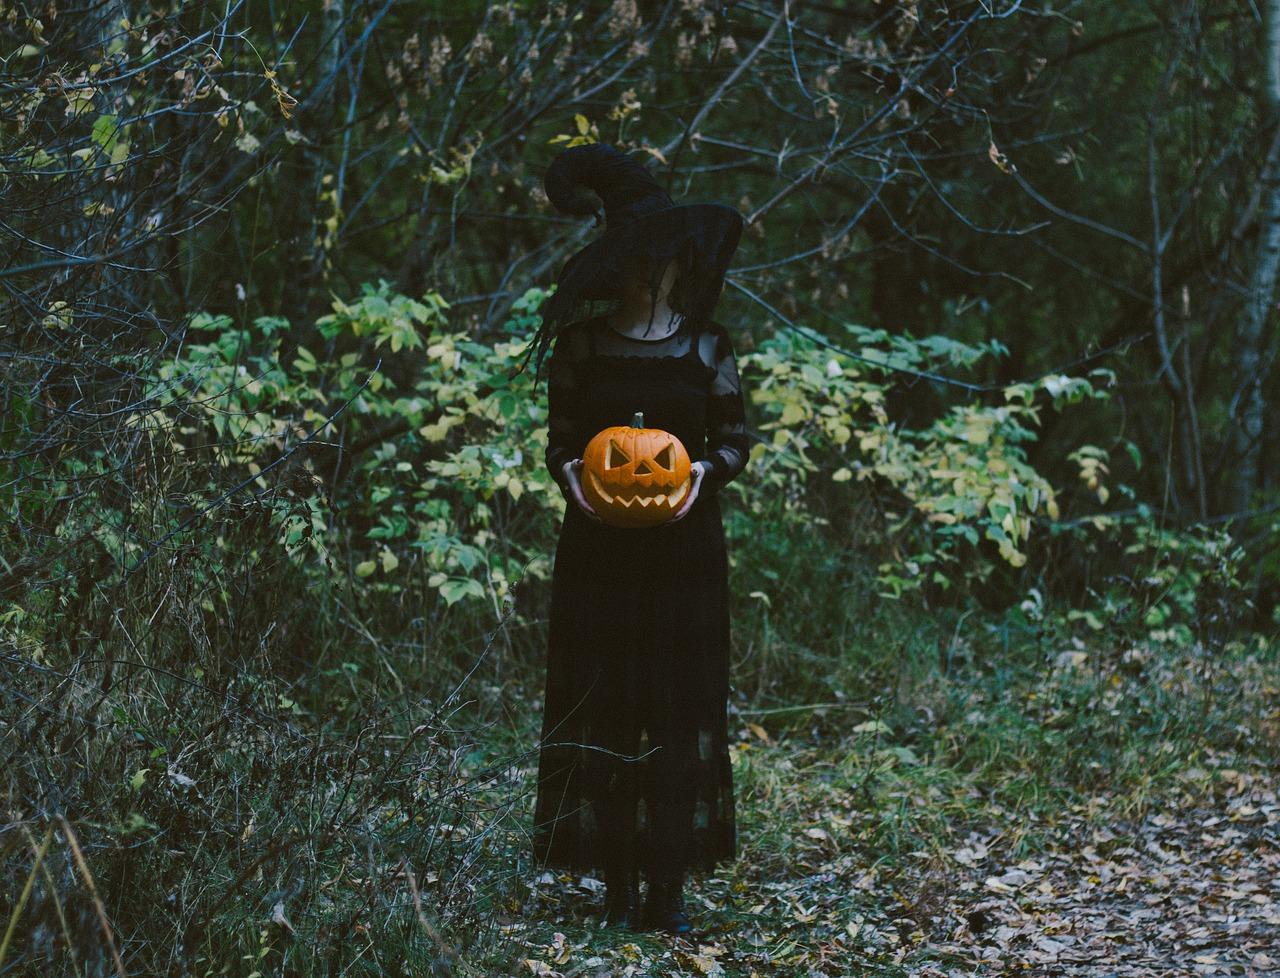 Halloween, da Squid Game alla Casa di Carta: ecco i costumi più originali